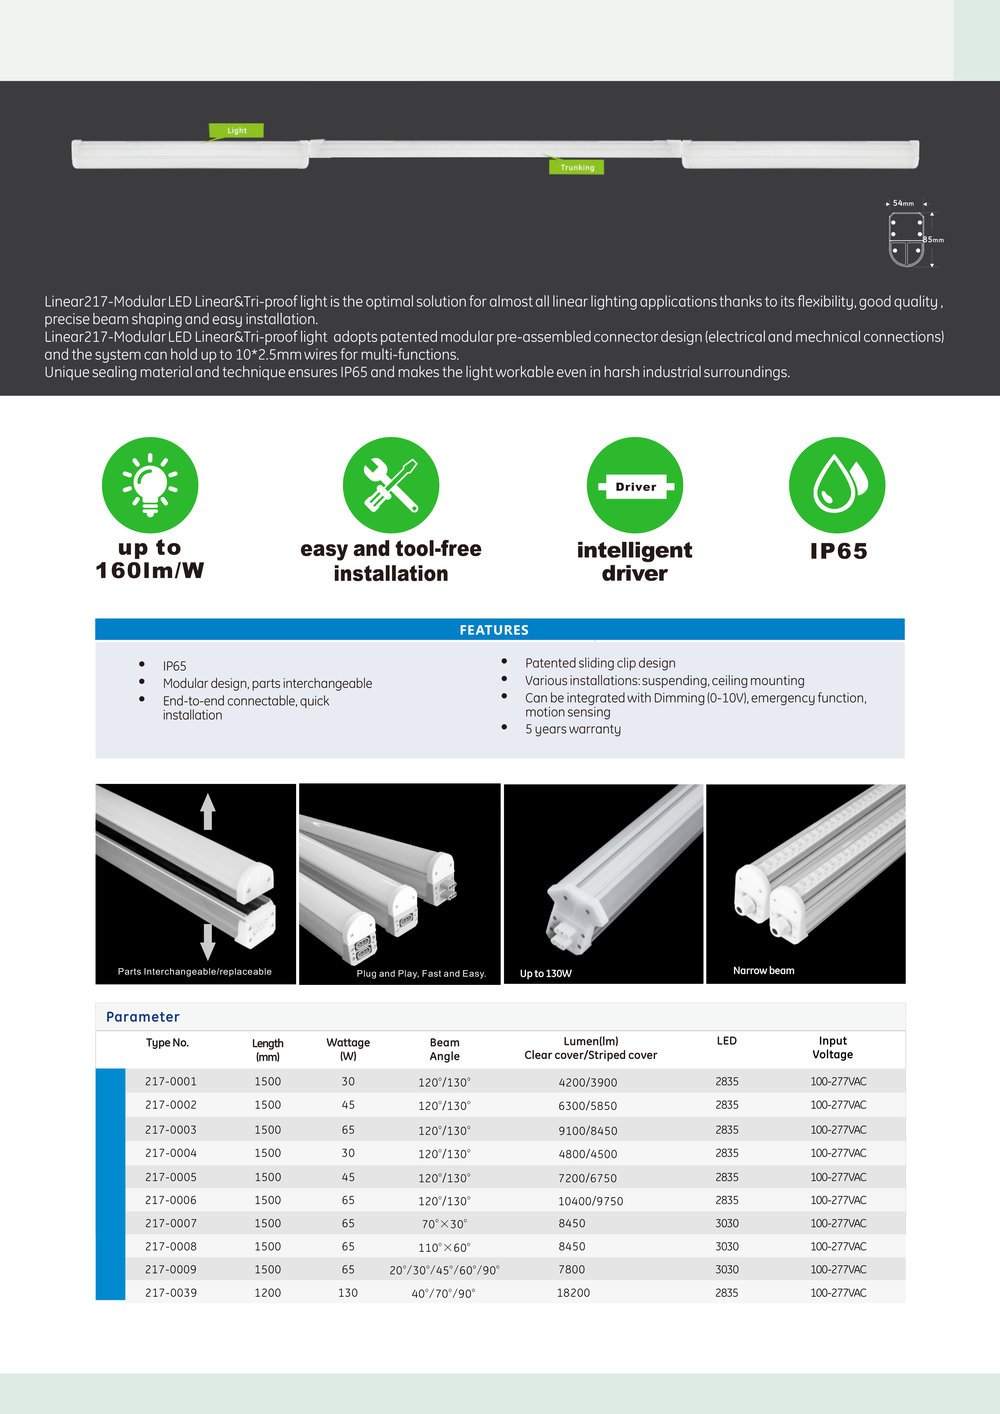 TriProof-Flex-Linear217-Introduction-V01-2.jpg